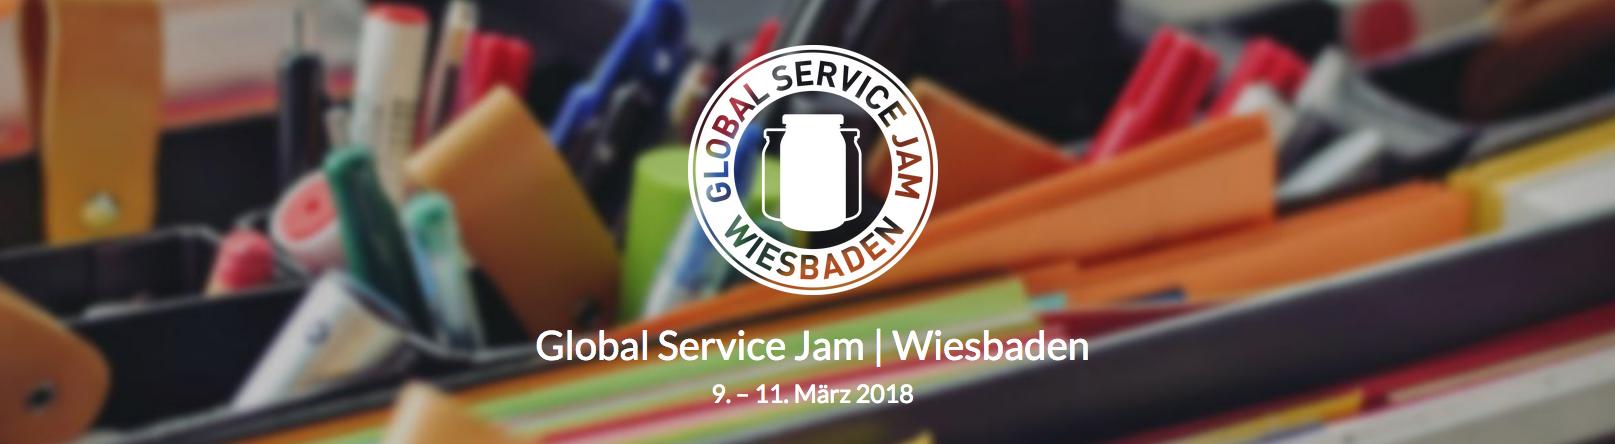 Global Service Jam Wiesbaden 2018